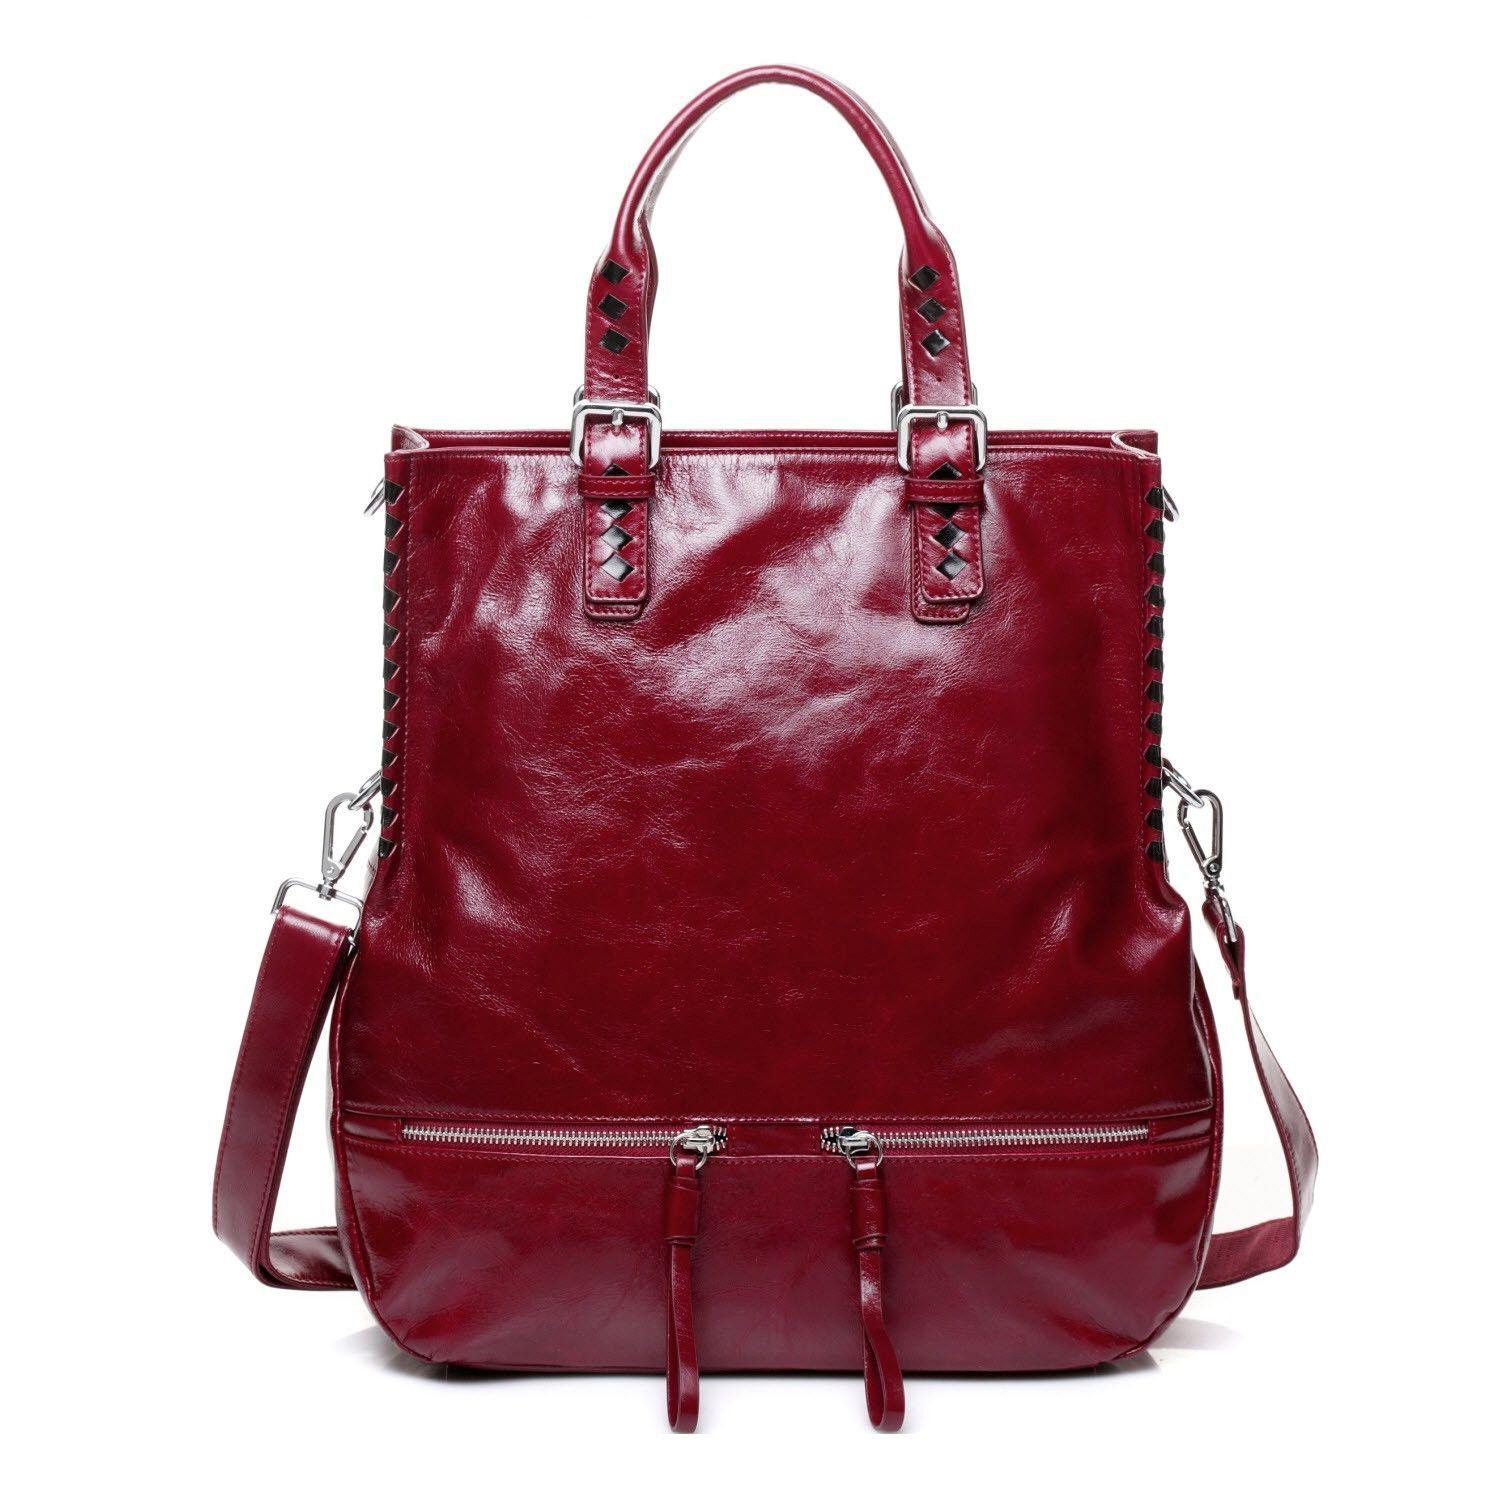 Kermes Crimson Italian Leather Tote Shoulder Handbag w/ Coin Purse - Red